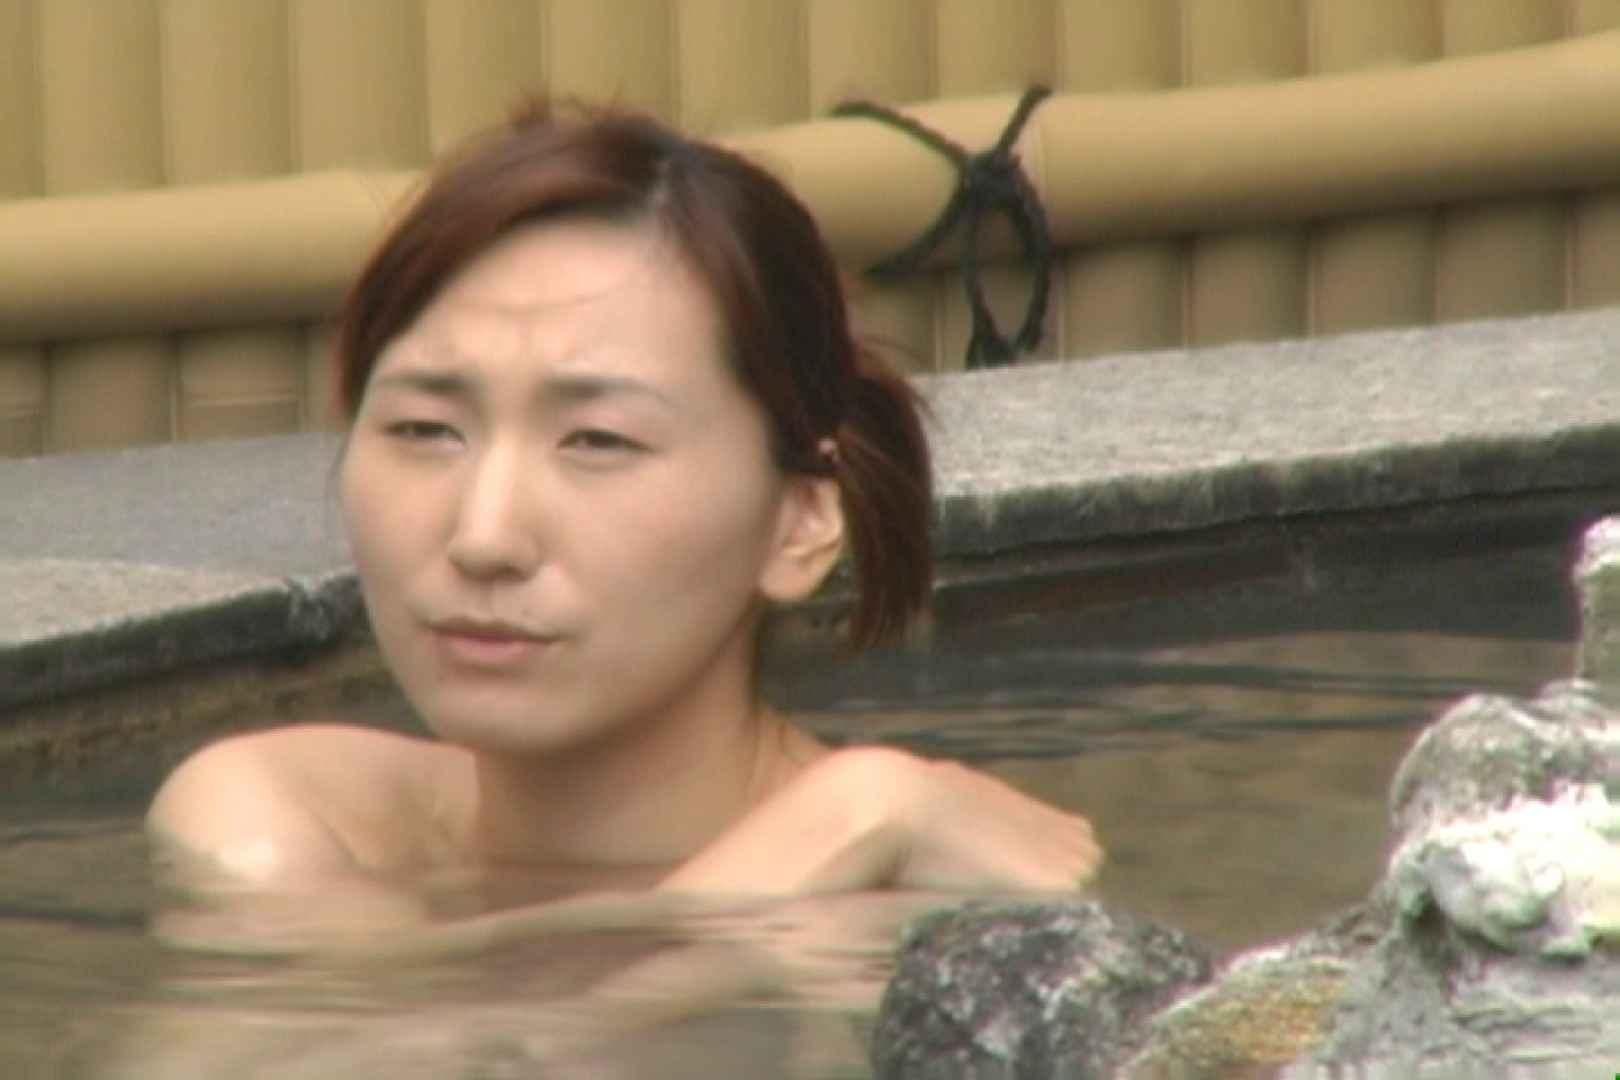 Aquaな露天風呂Vol.616 露天風呂編   盗撮シリーズ  89PIX 29